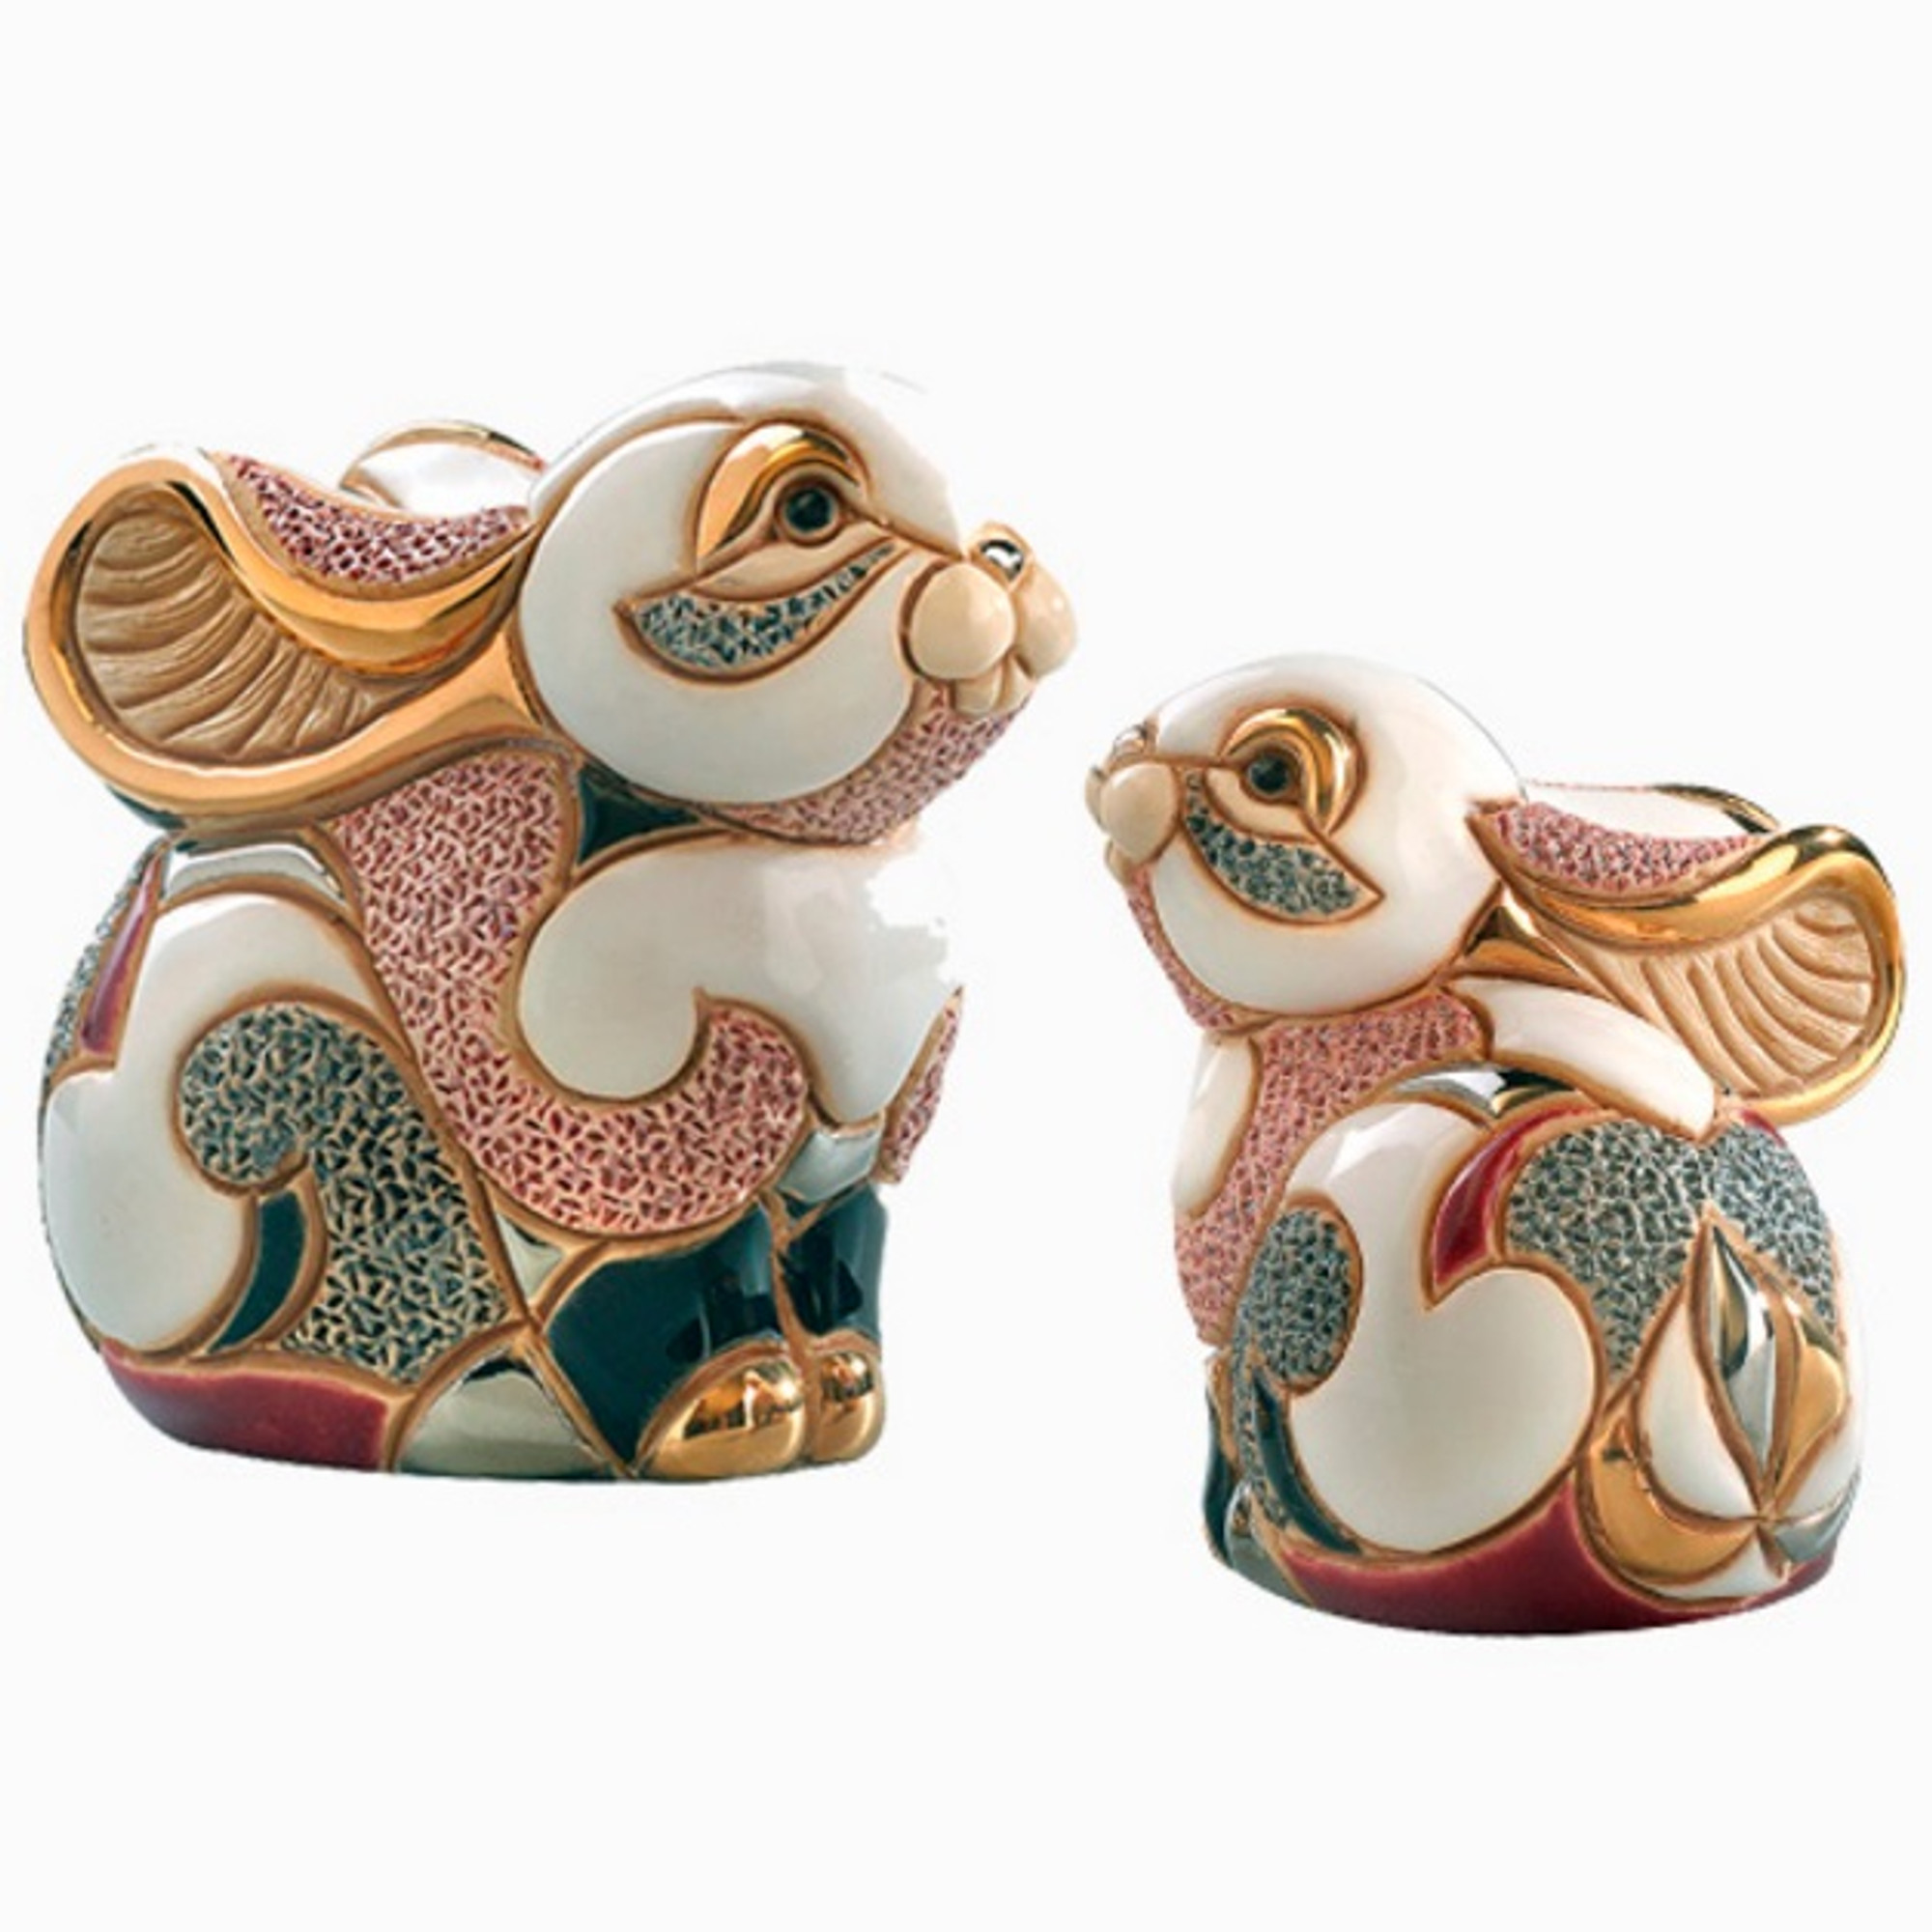 De Rosa Baby White Frog Figurine NEW in Gift Box